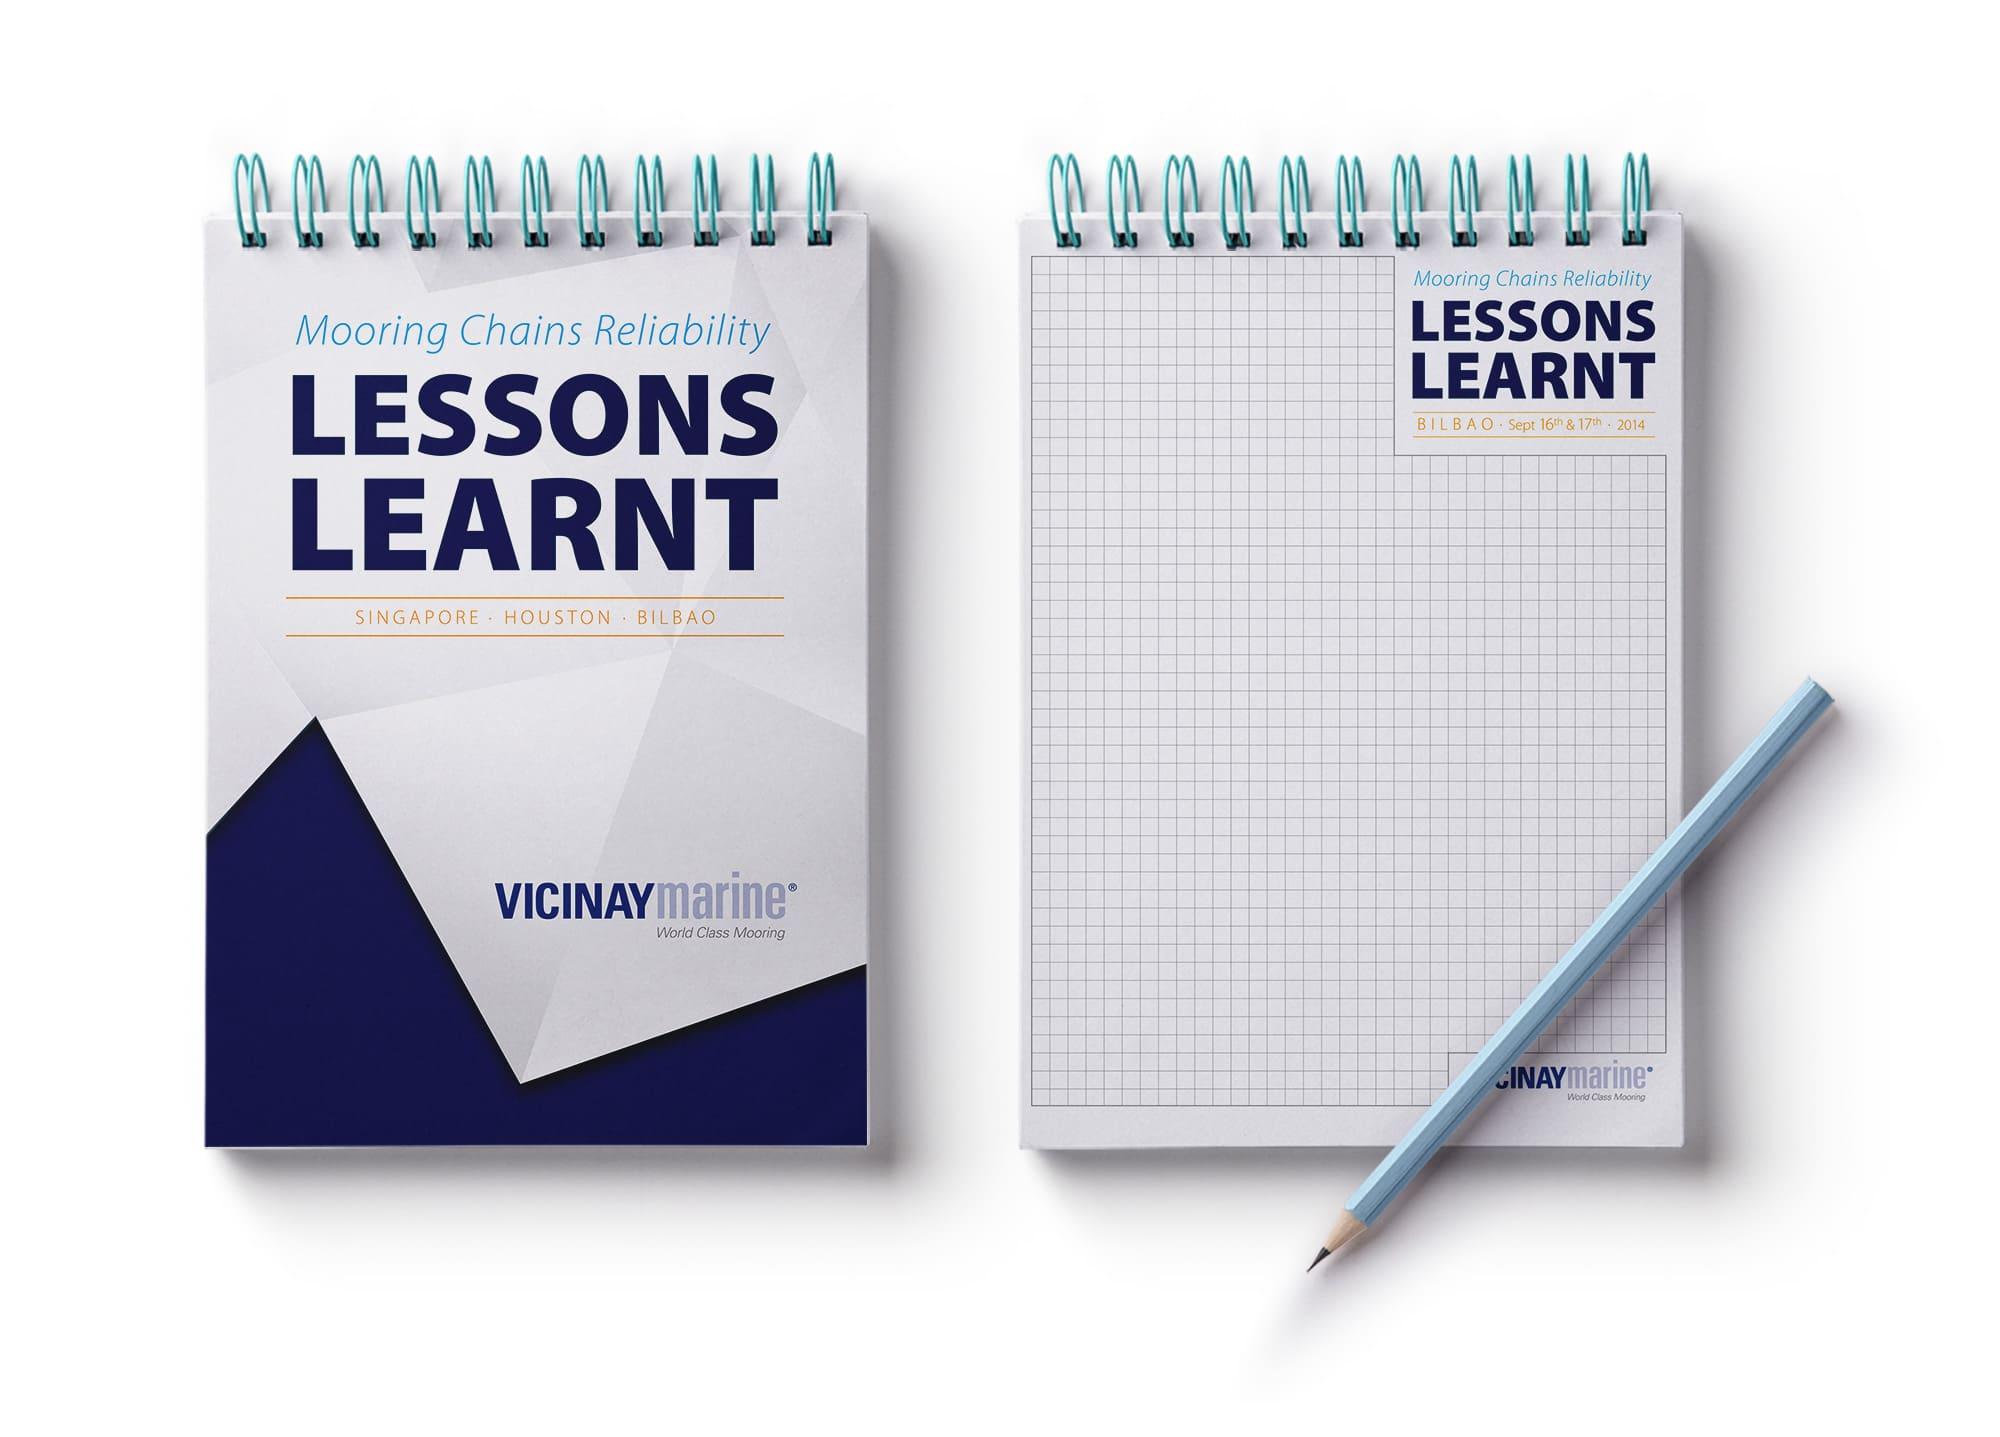 Sirope-Proyectos-Vicinay-Seminarios Vicinay-cuaderno